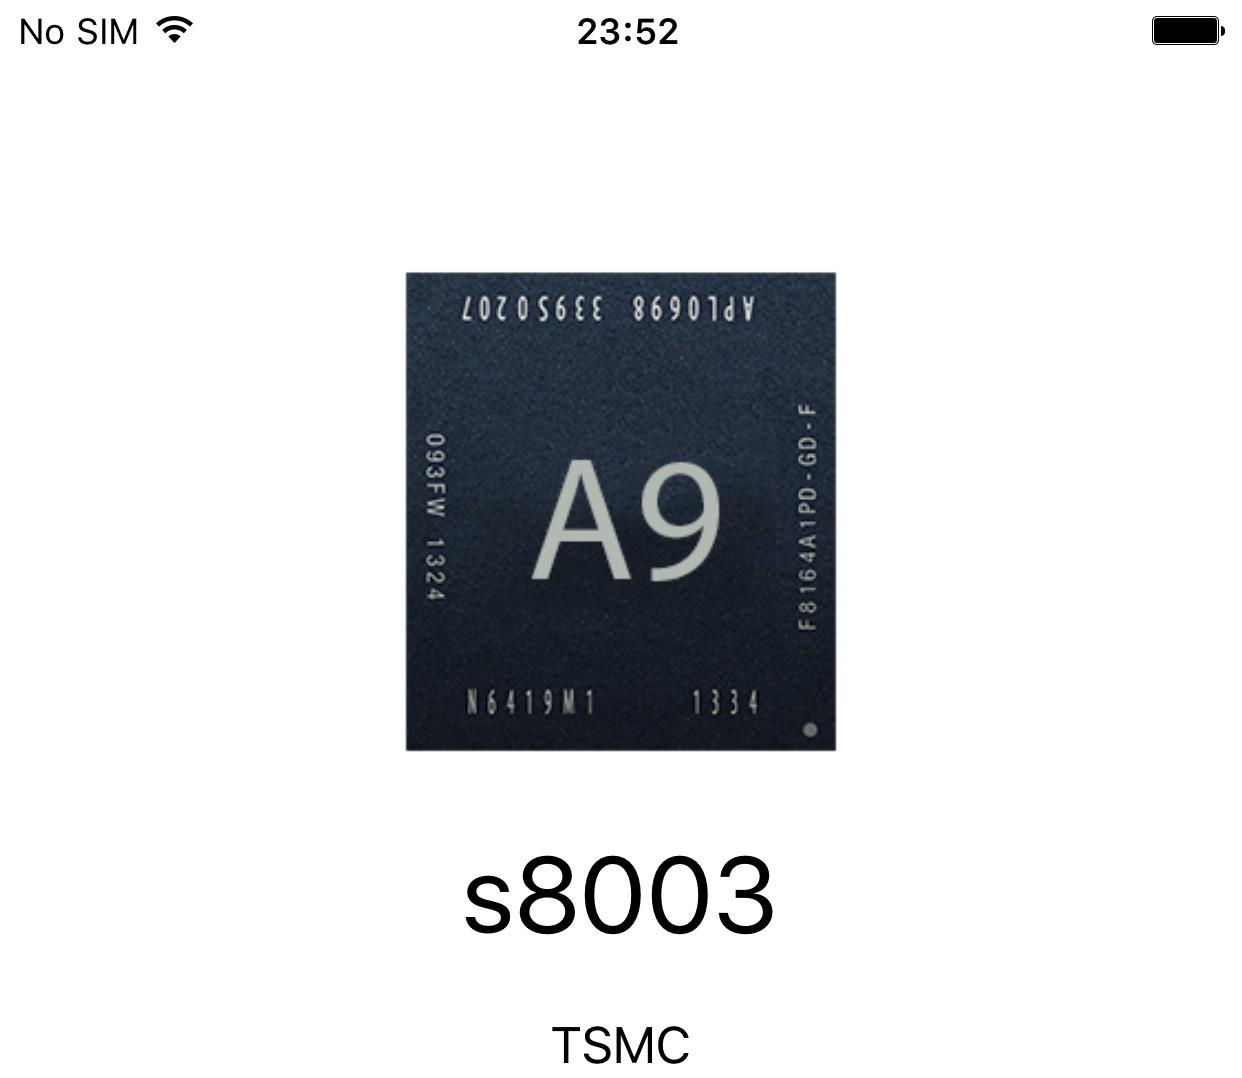 Cum vad ce chip are iPhone 6S inainte de achizitie